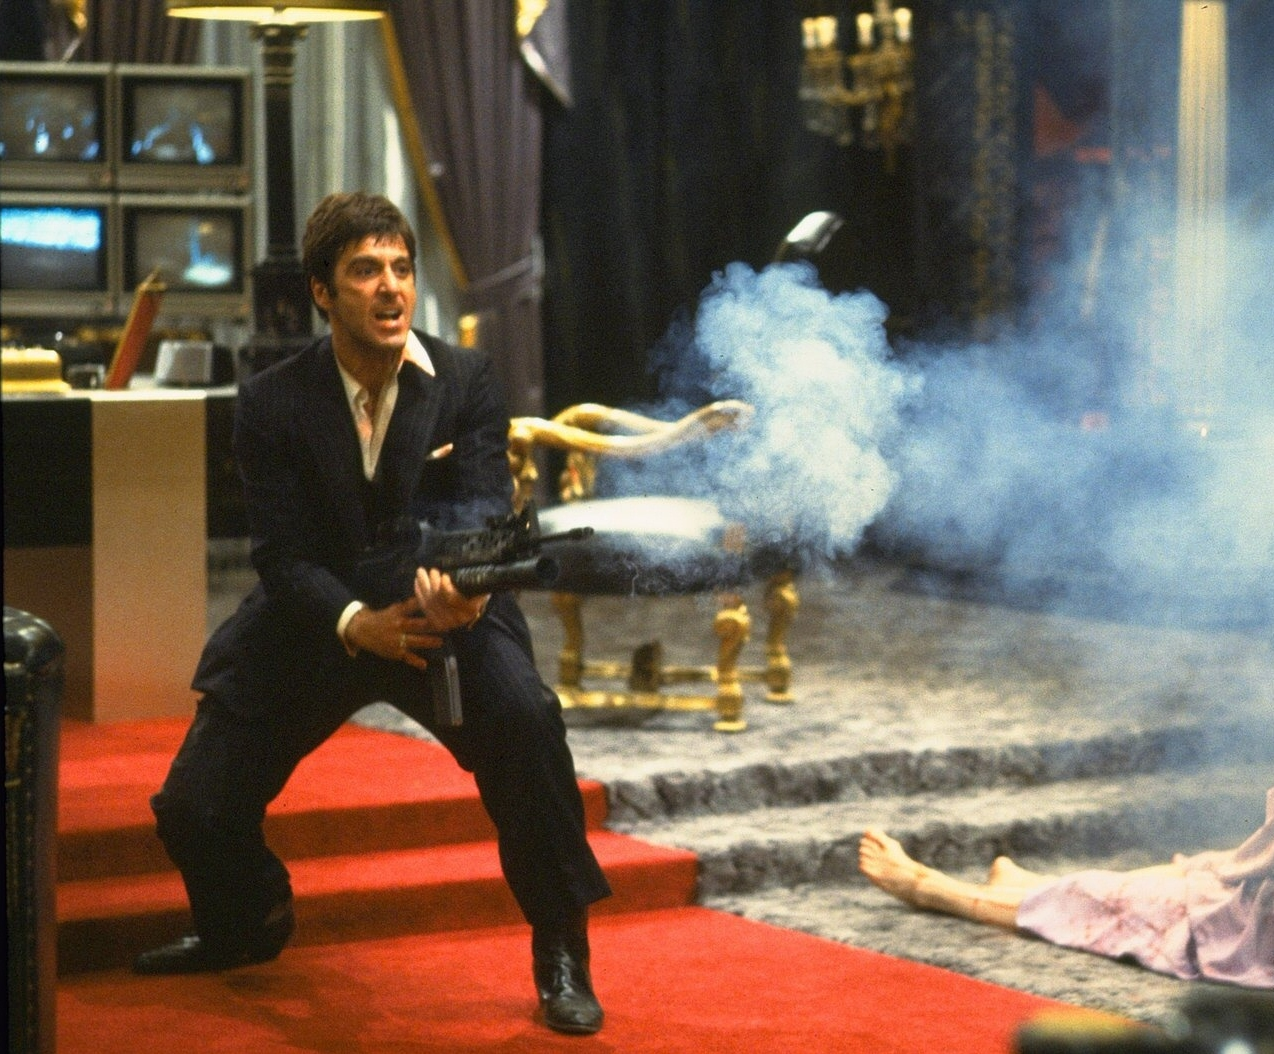 http://3.bp.blogspot.com/-SPjDwmKpXYA/URC9Zn-As7I/AAAAAAAAFBE/03R-4mYwmOg/s1600/Scarface-Al-Pacino-Tony-Montana-opens-fire-climax.jpg